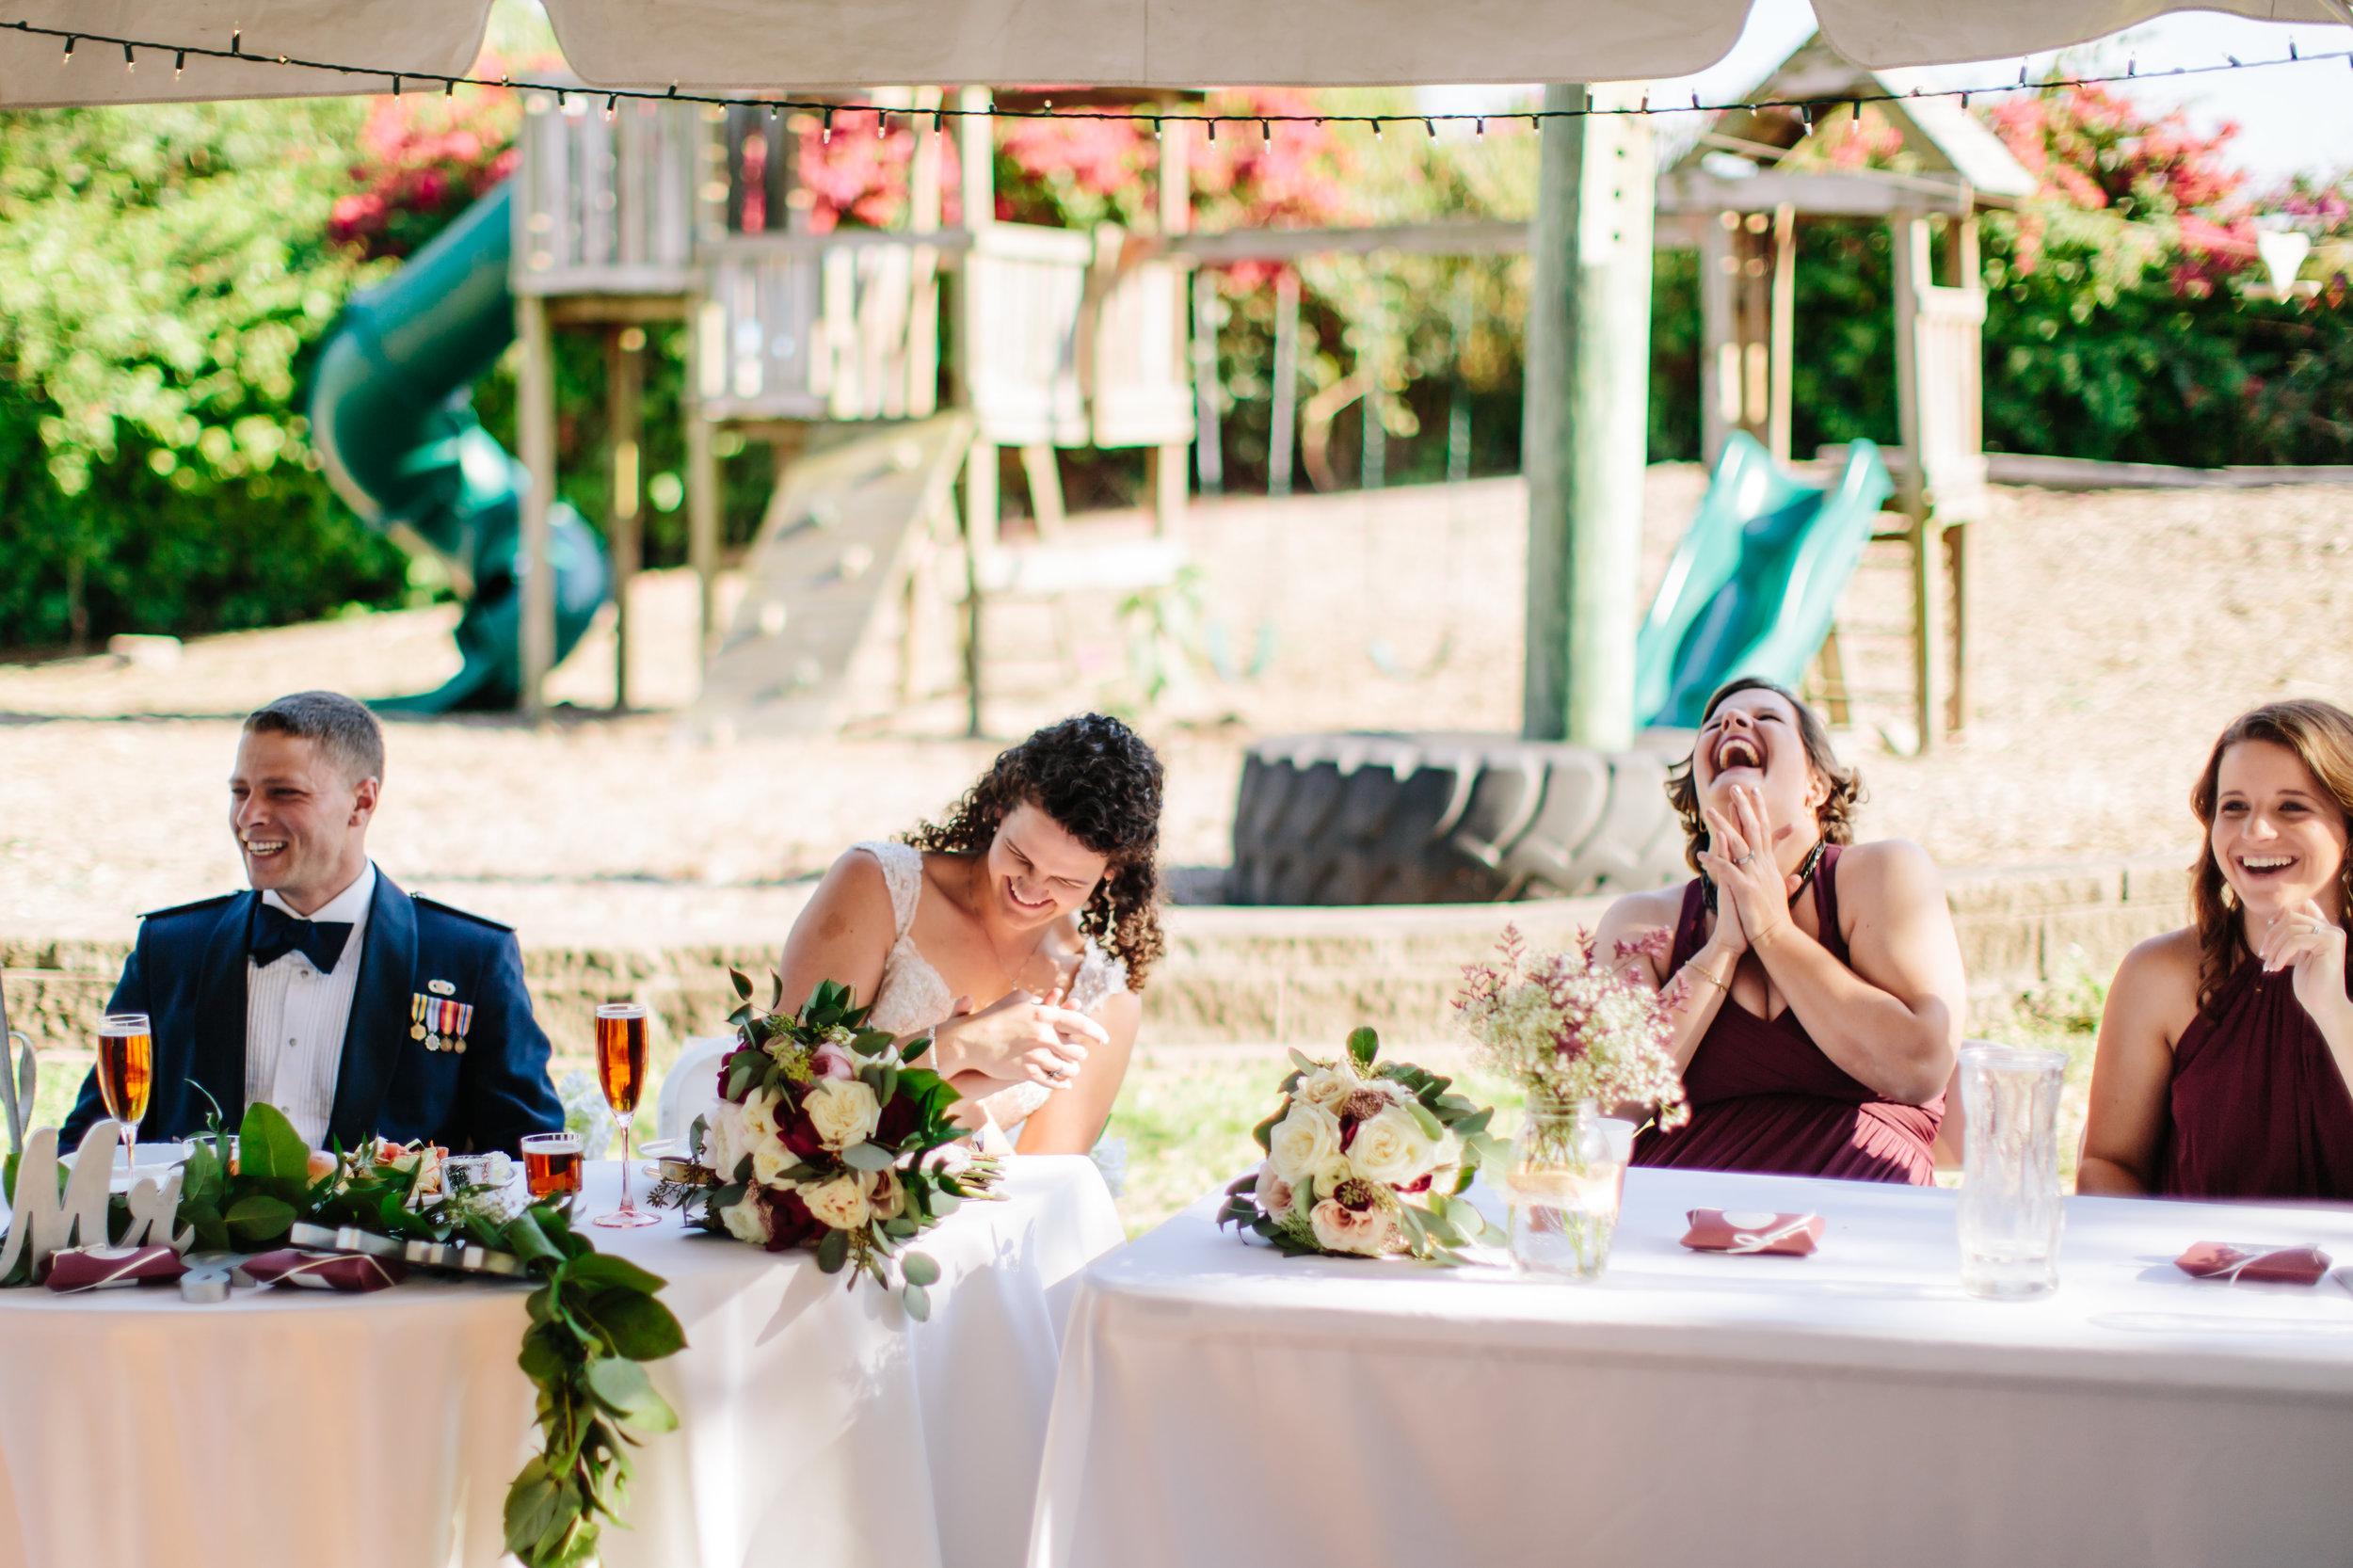 2018.03.17 Allison and Chuck Wedding Waelti Melbourne (611 of 569).jpg